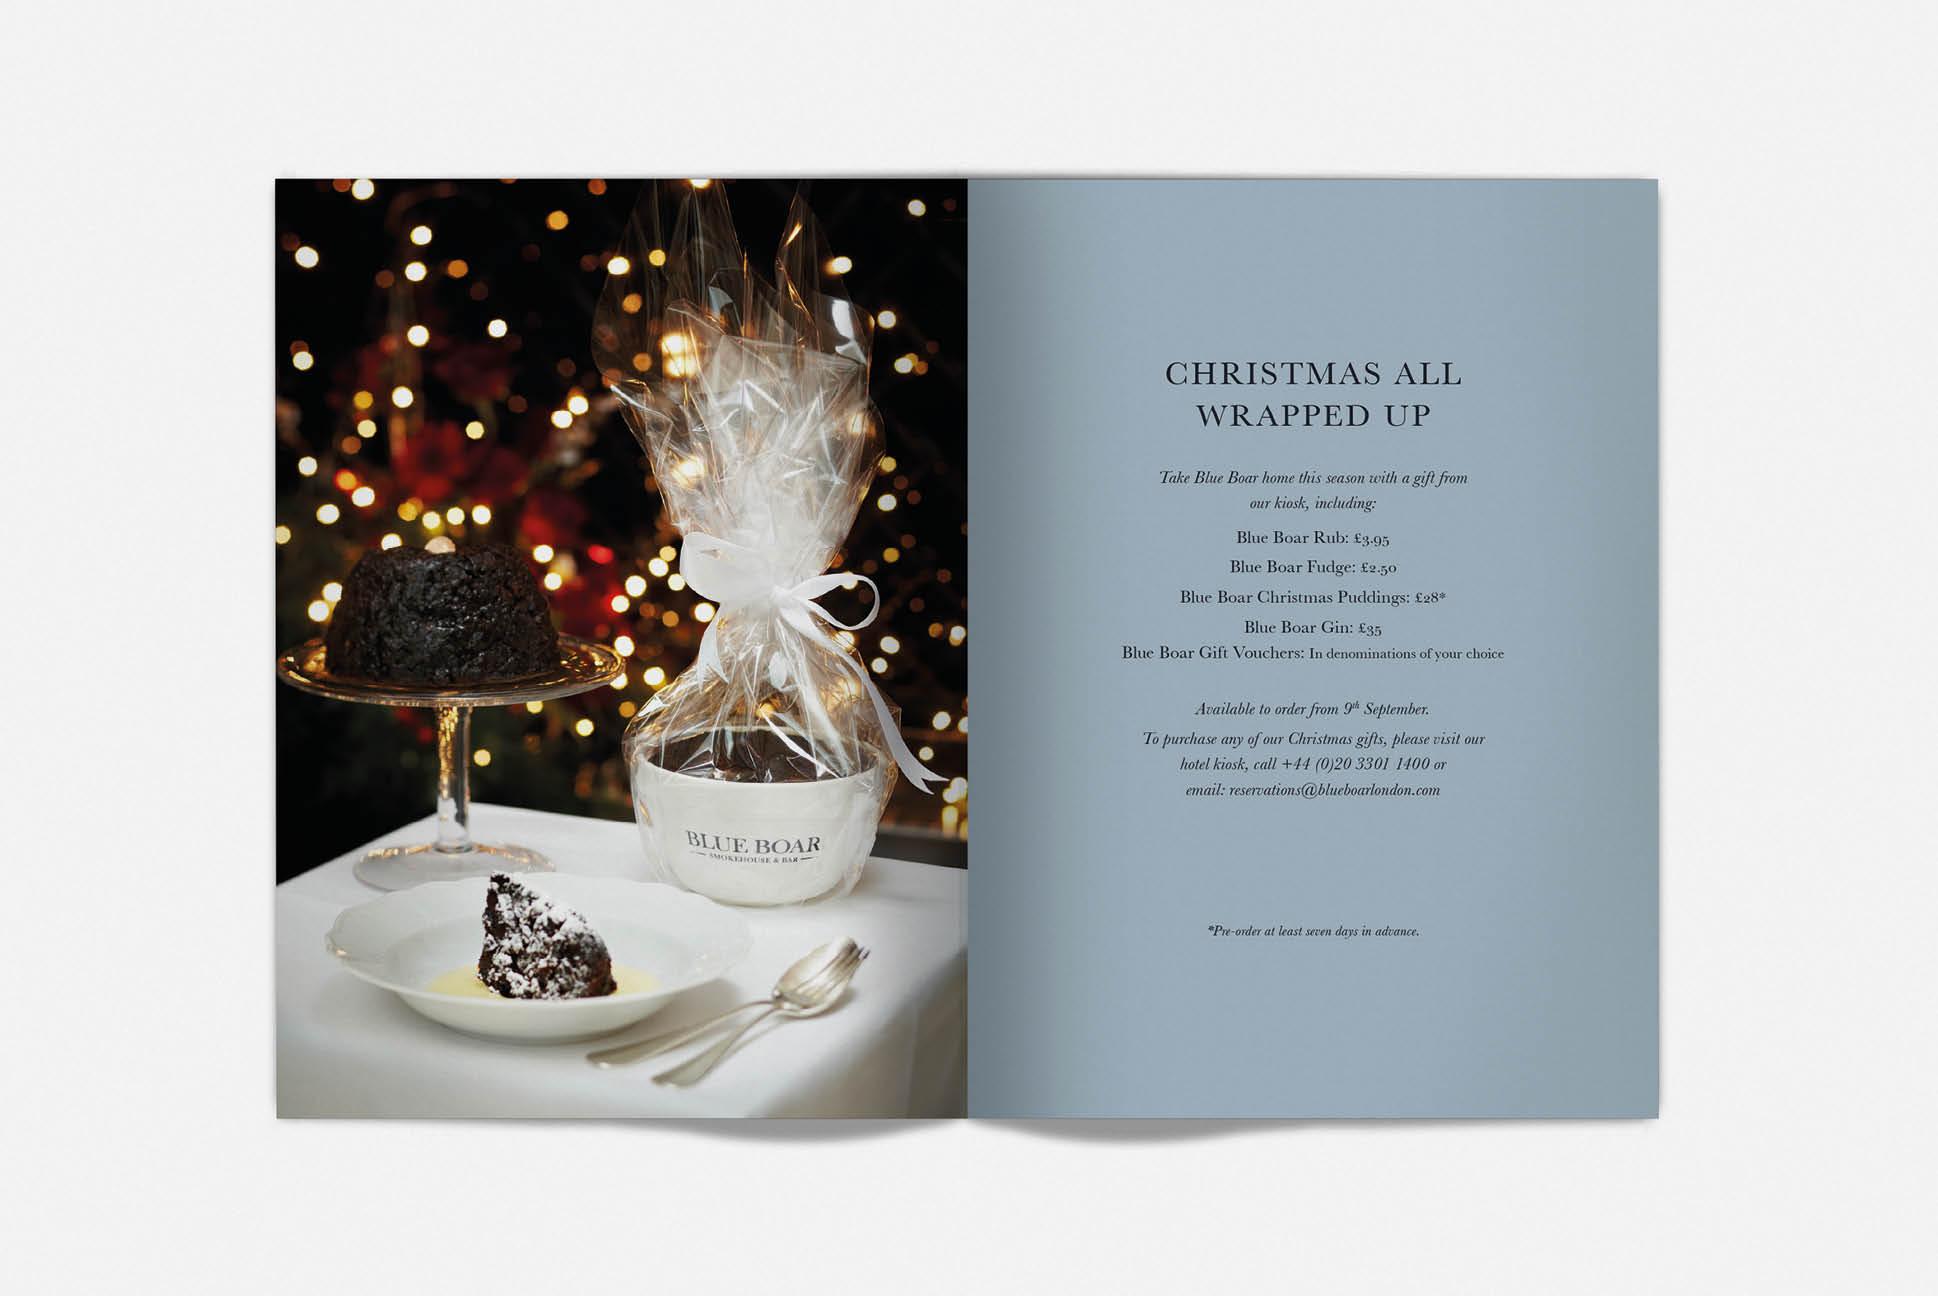 Blue Boar Christmas brochure